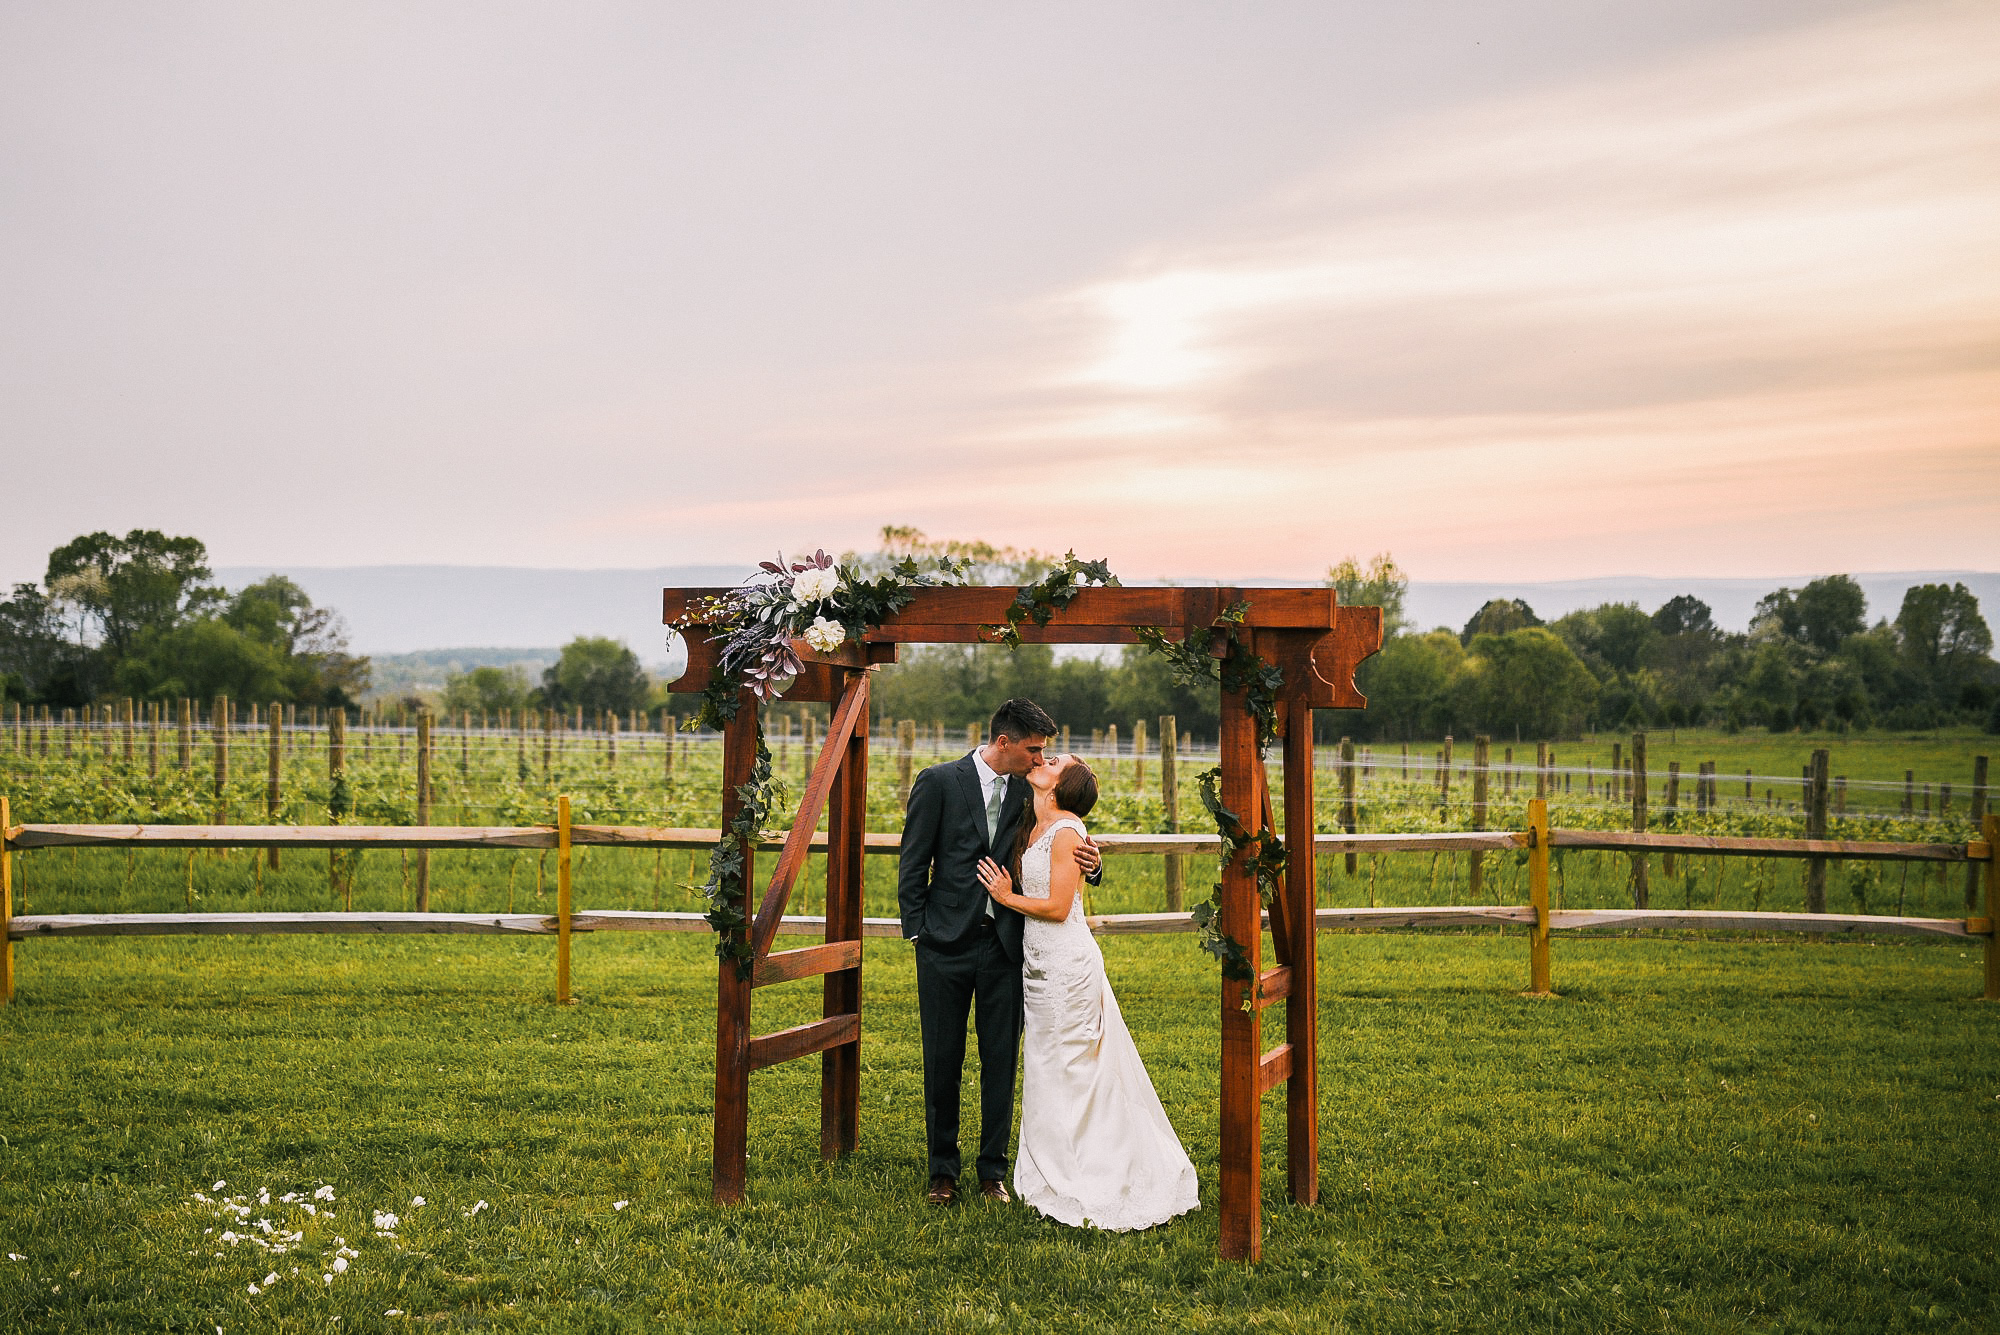 wedding-photography-virginia_0035.jpg